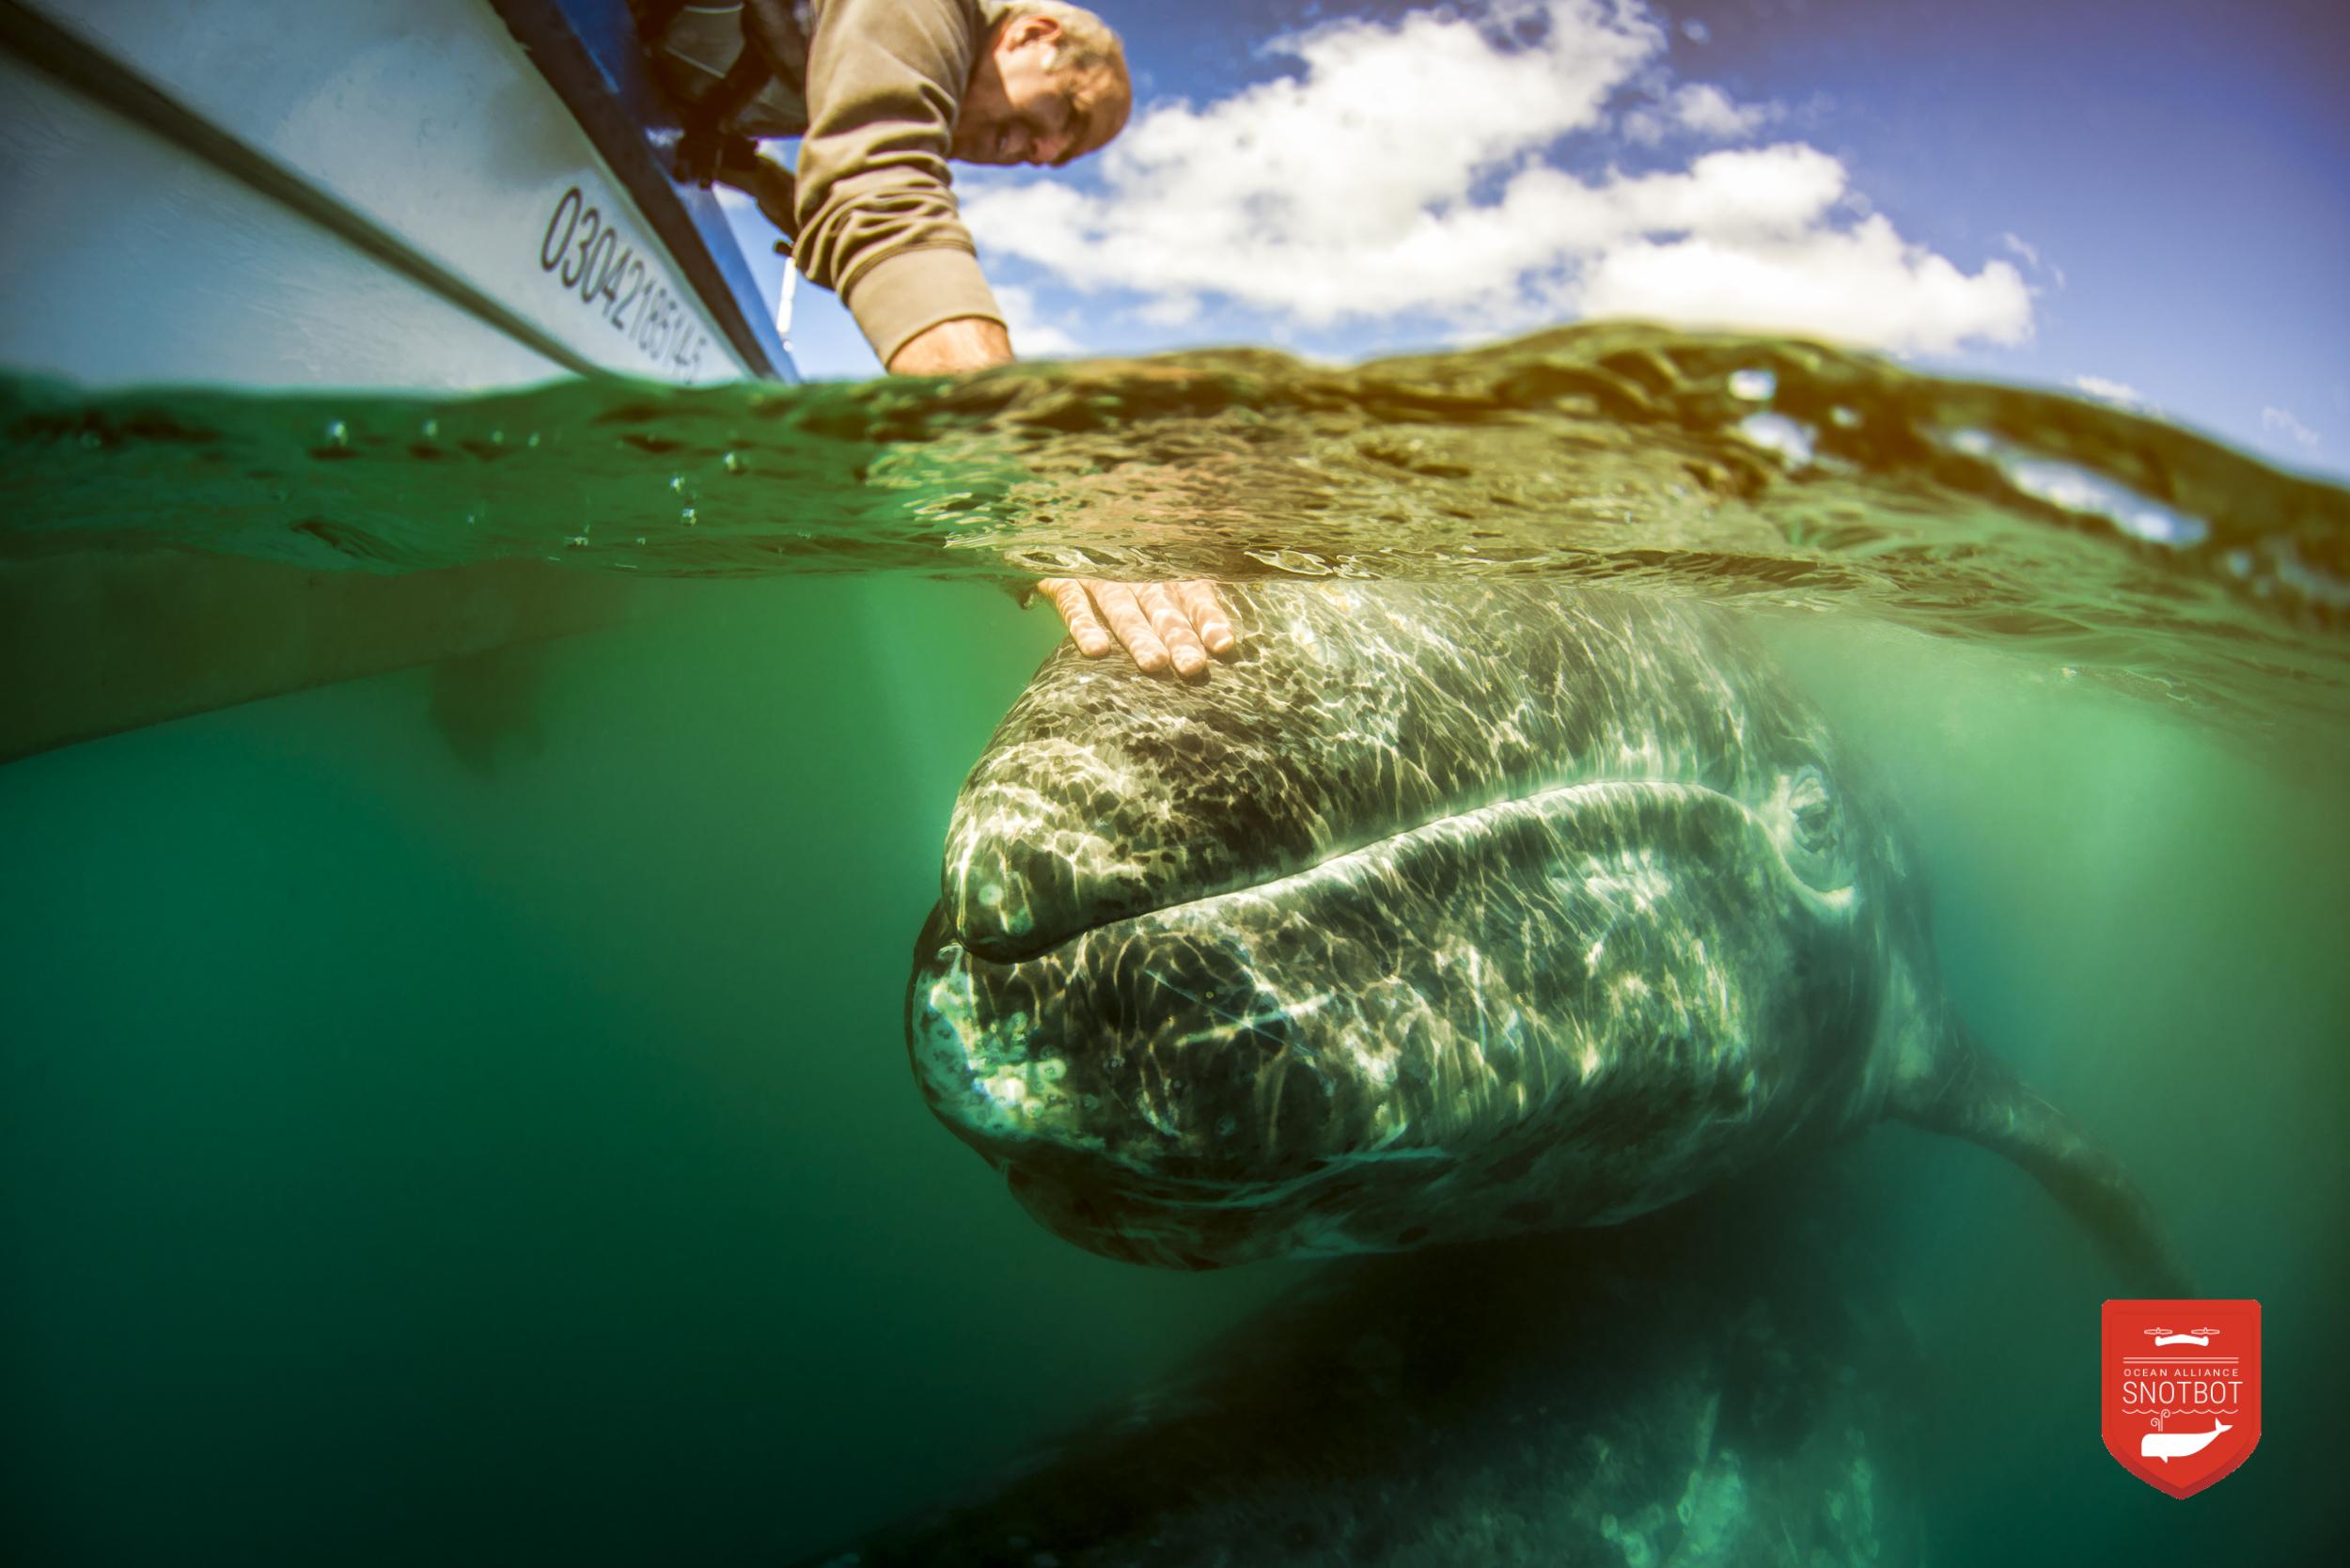 Ocean Alliance Mexico expedition. Photo: Christian Miller